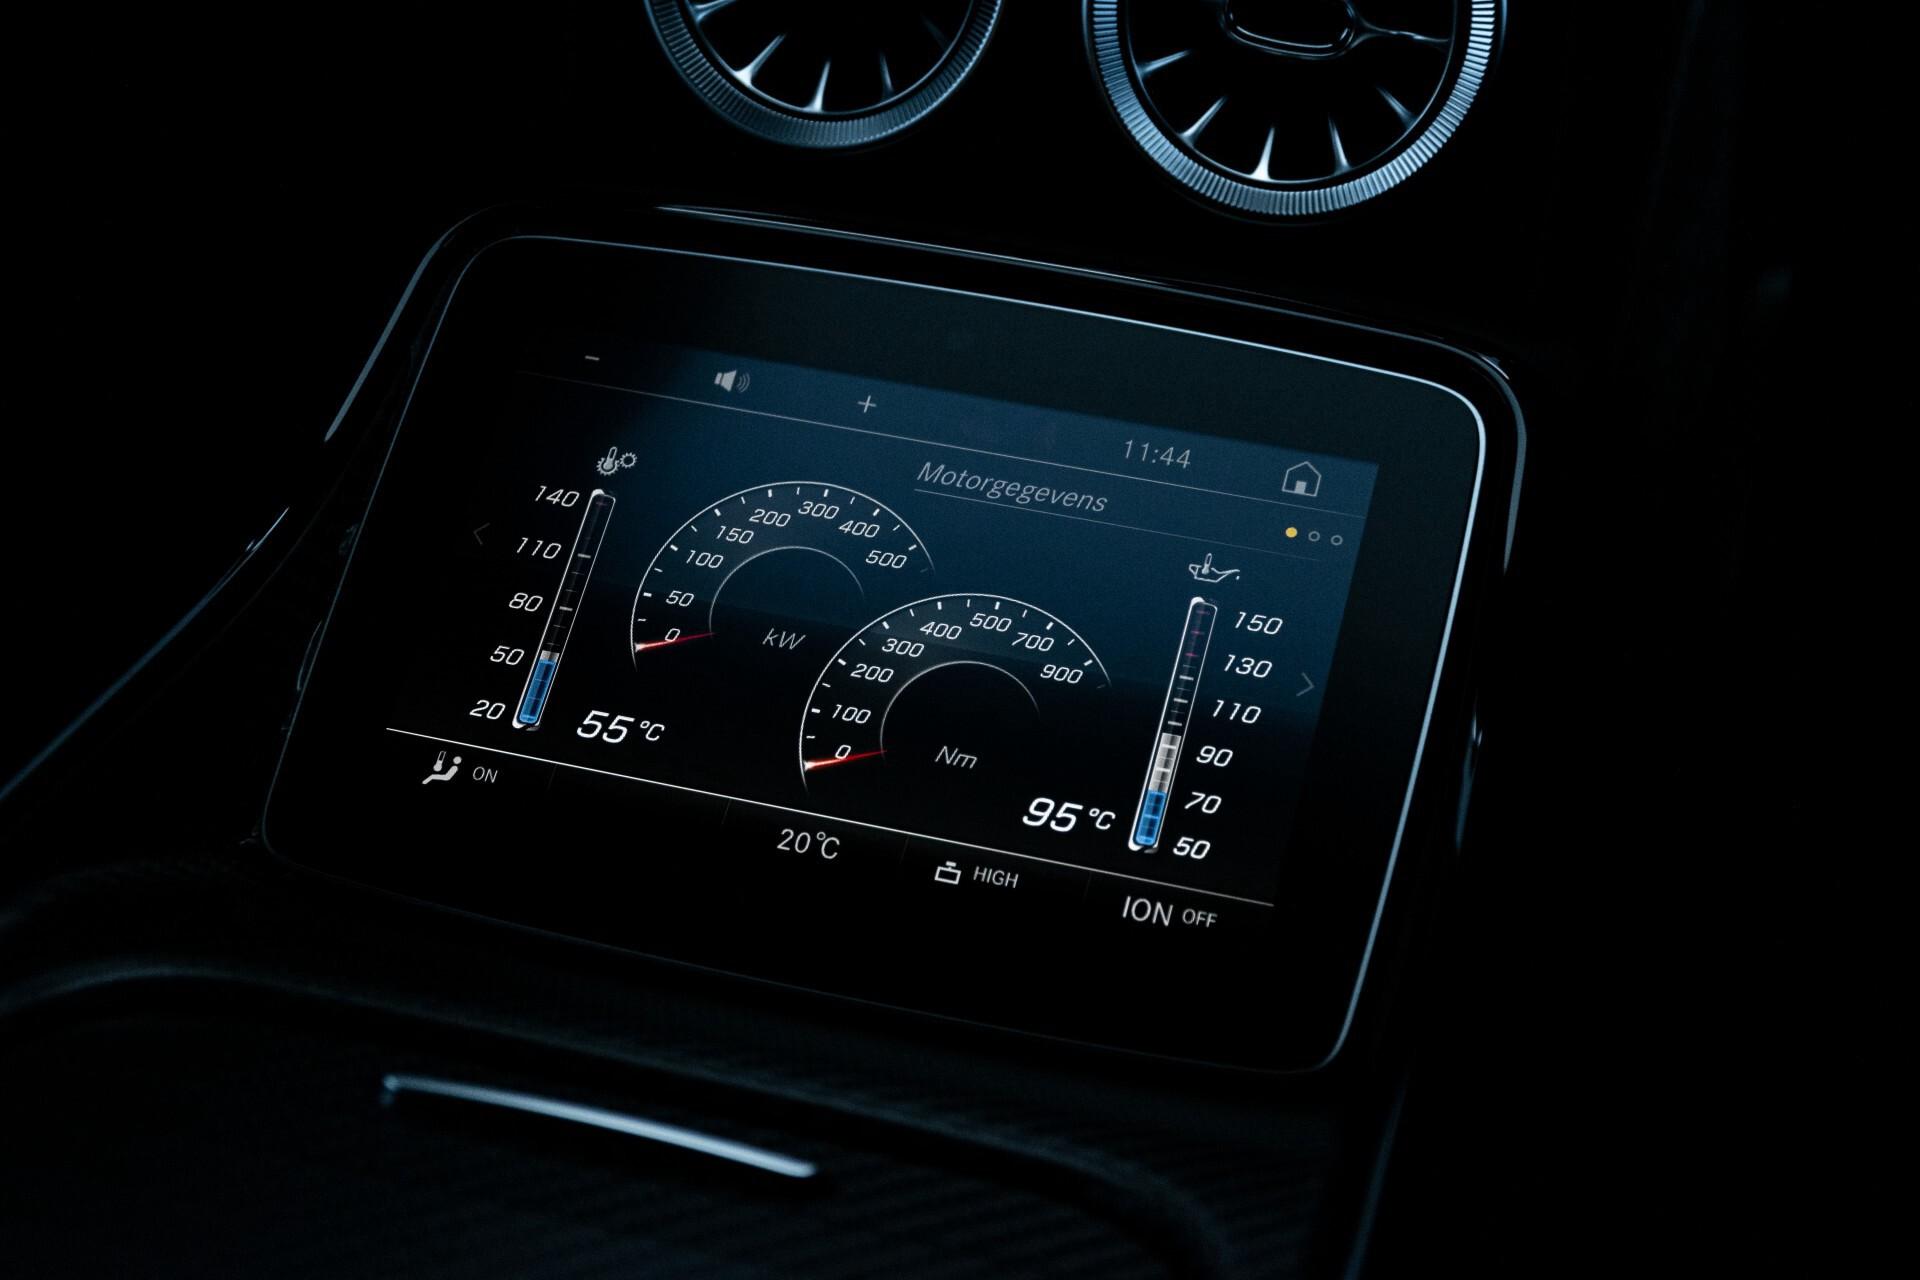 Mercedes-Benz AMG GT 4-Door Coupe 63 S 4MATIC+ Edition 1 Keramisch/Carbon/First Class/Dynamic Plus/Burmester High End 3D Aut9 Foto 73